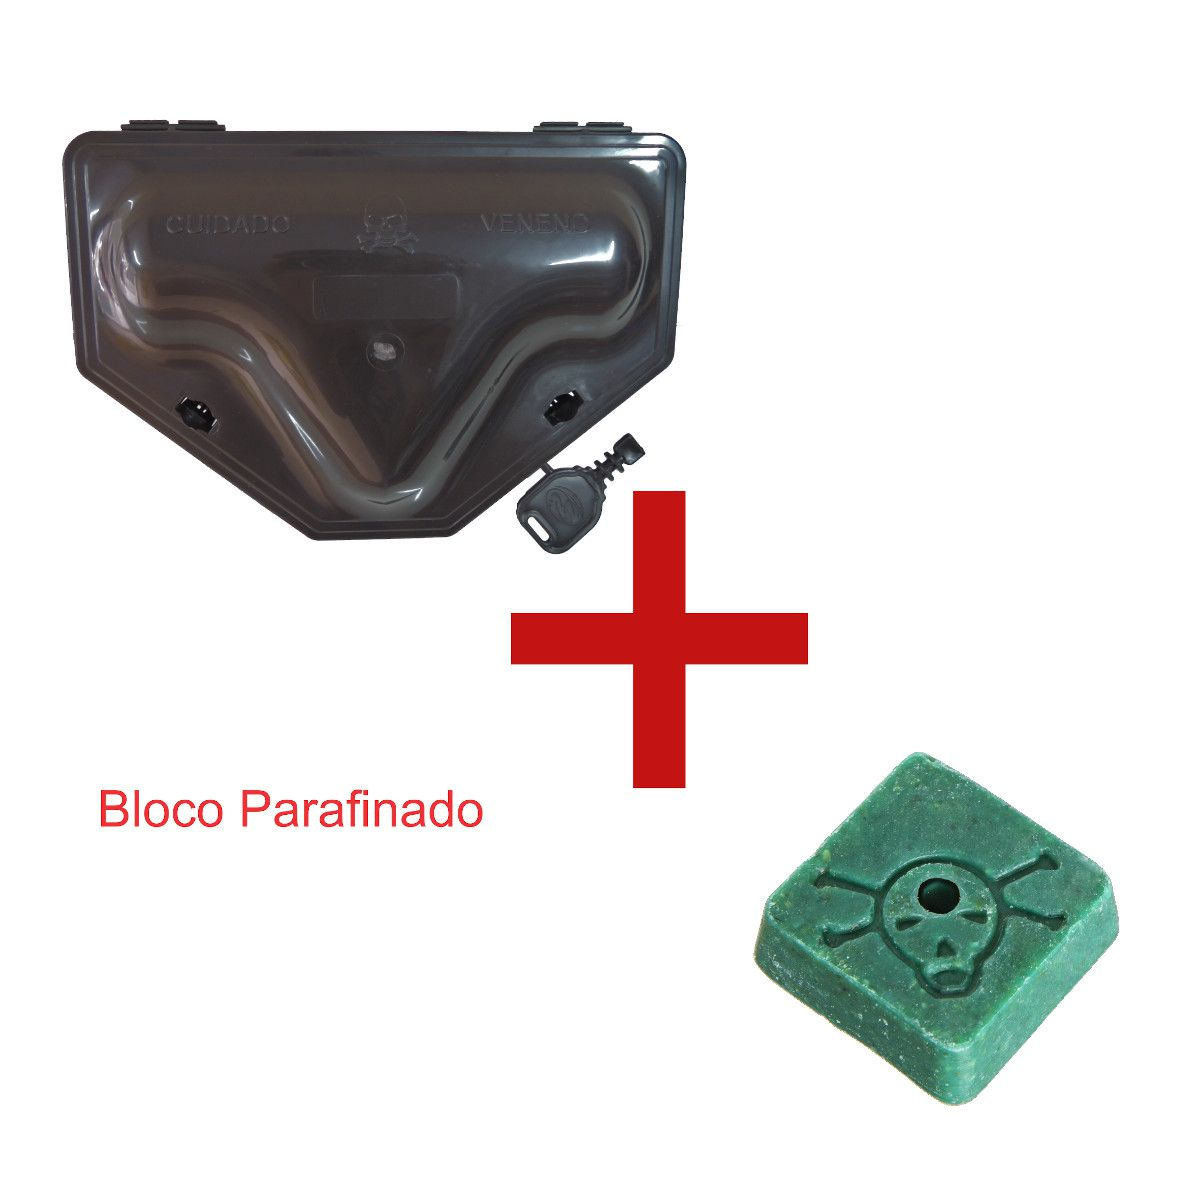 KIT 16 Porta Iscas Armadilha Pega Ratos 2 TRAVAS c/ Chave